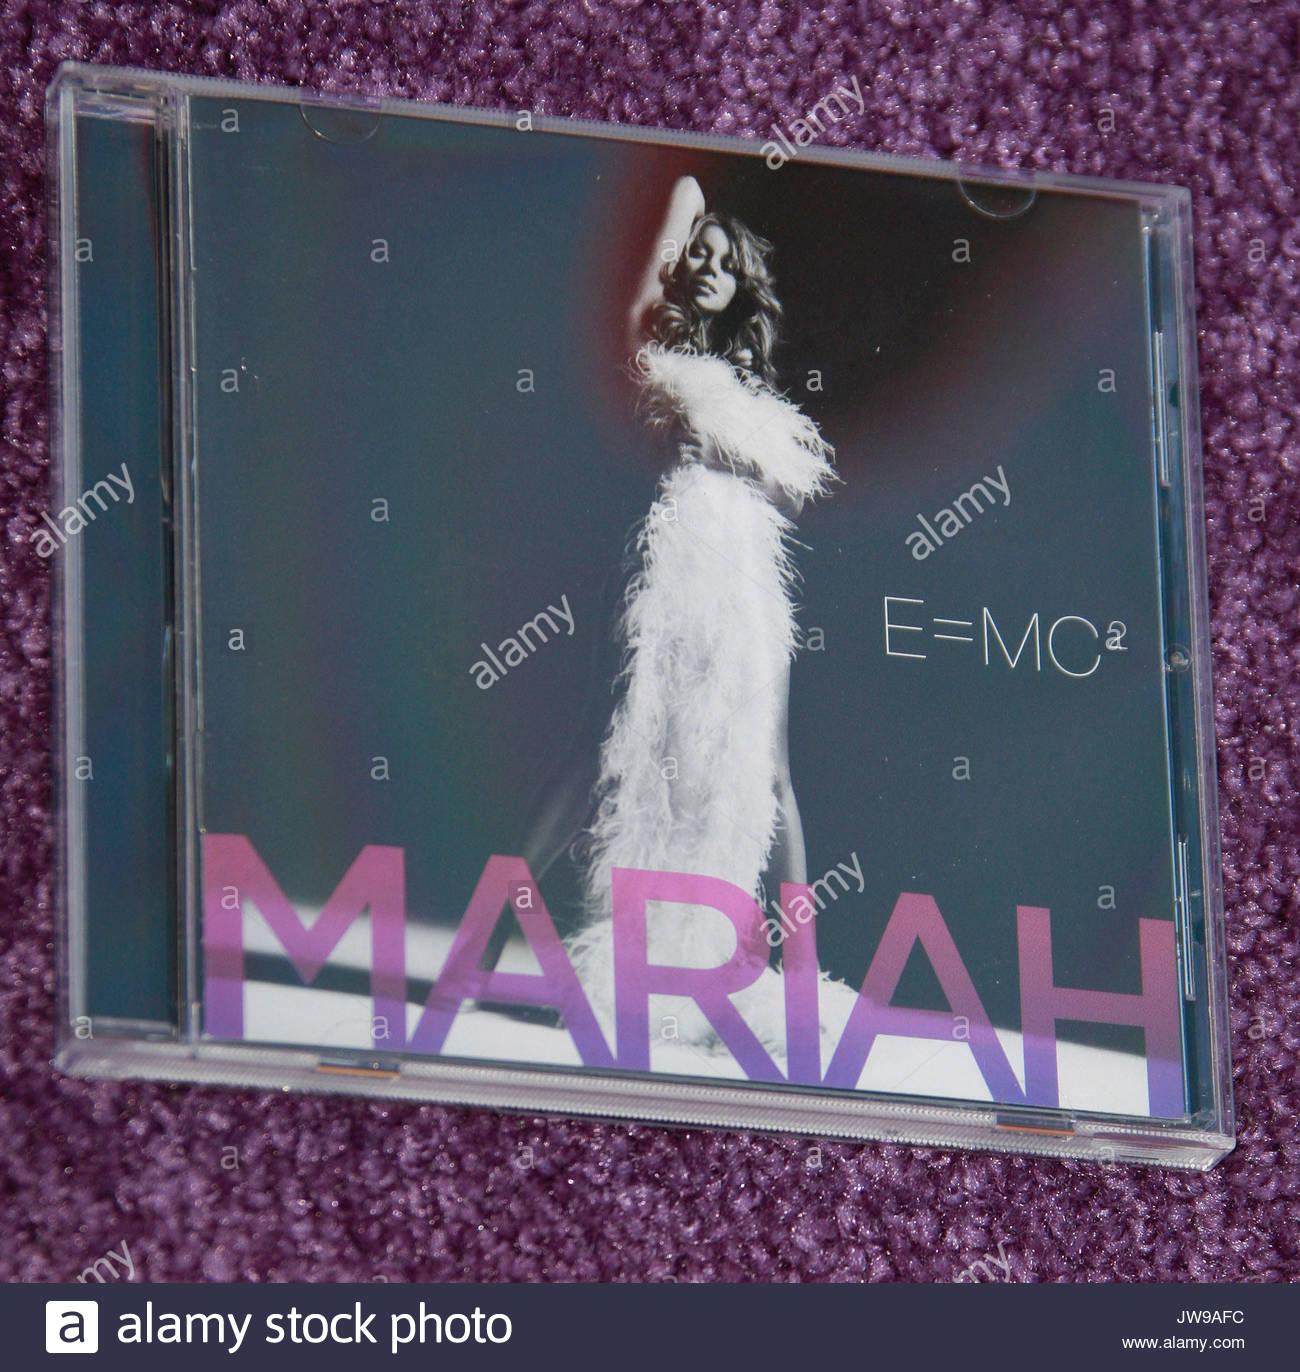 mariah carey new cd cover singer mariah carey was 2 1 2 hours late